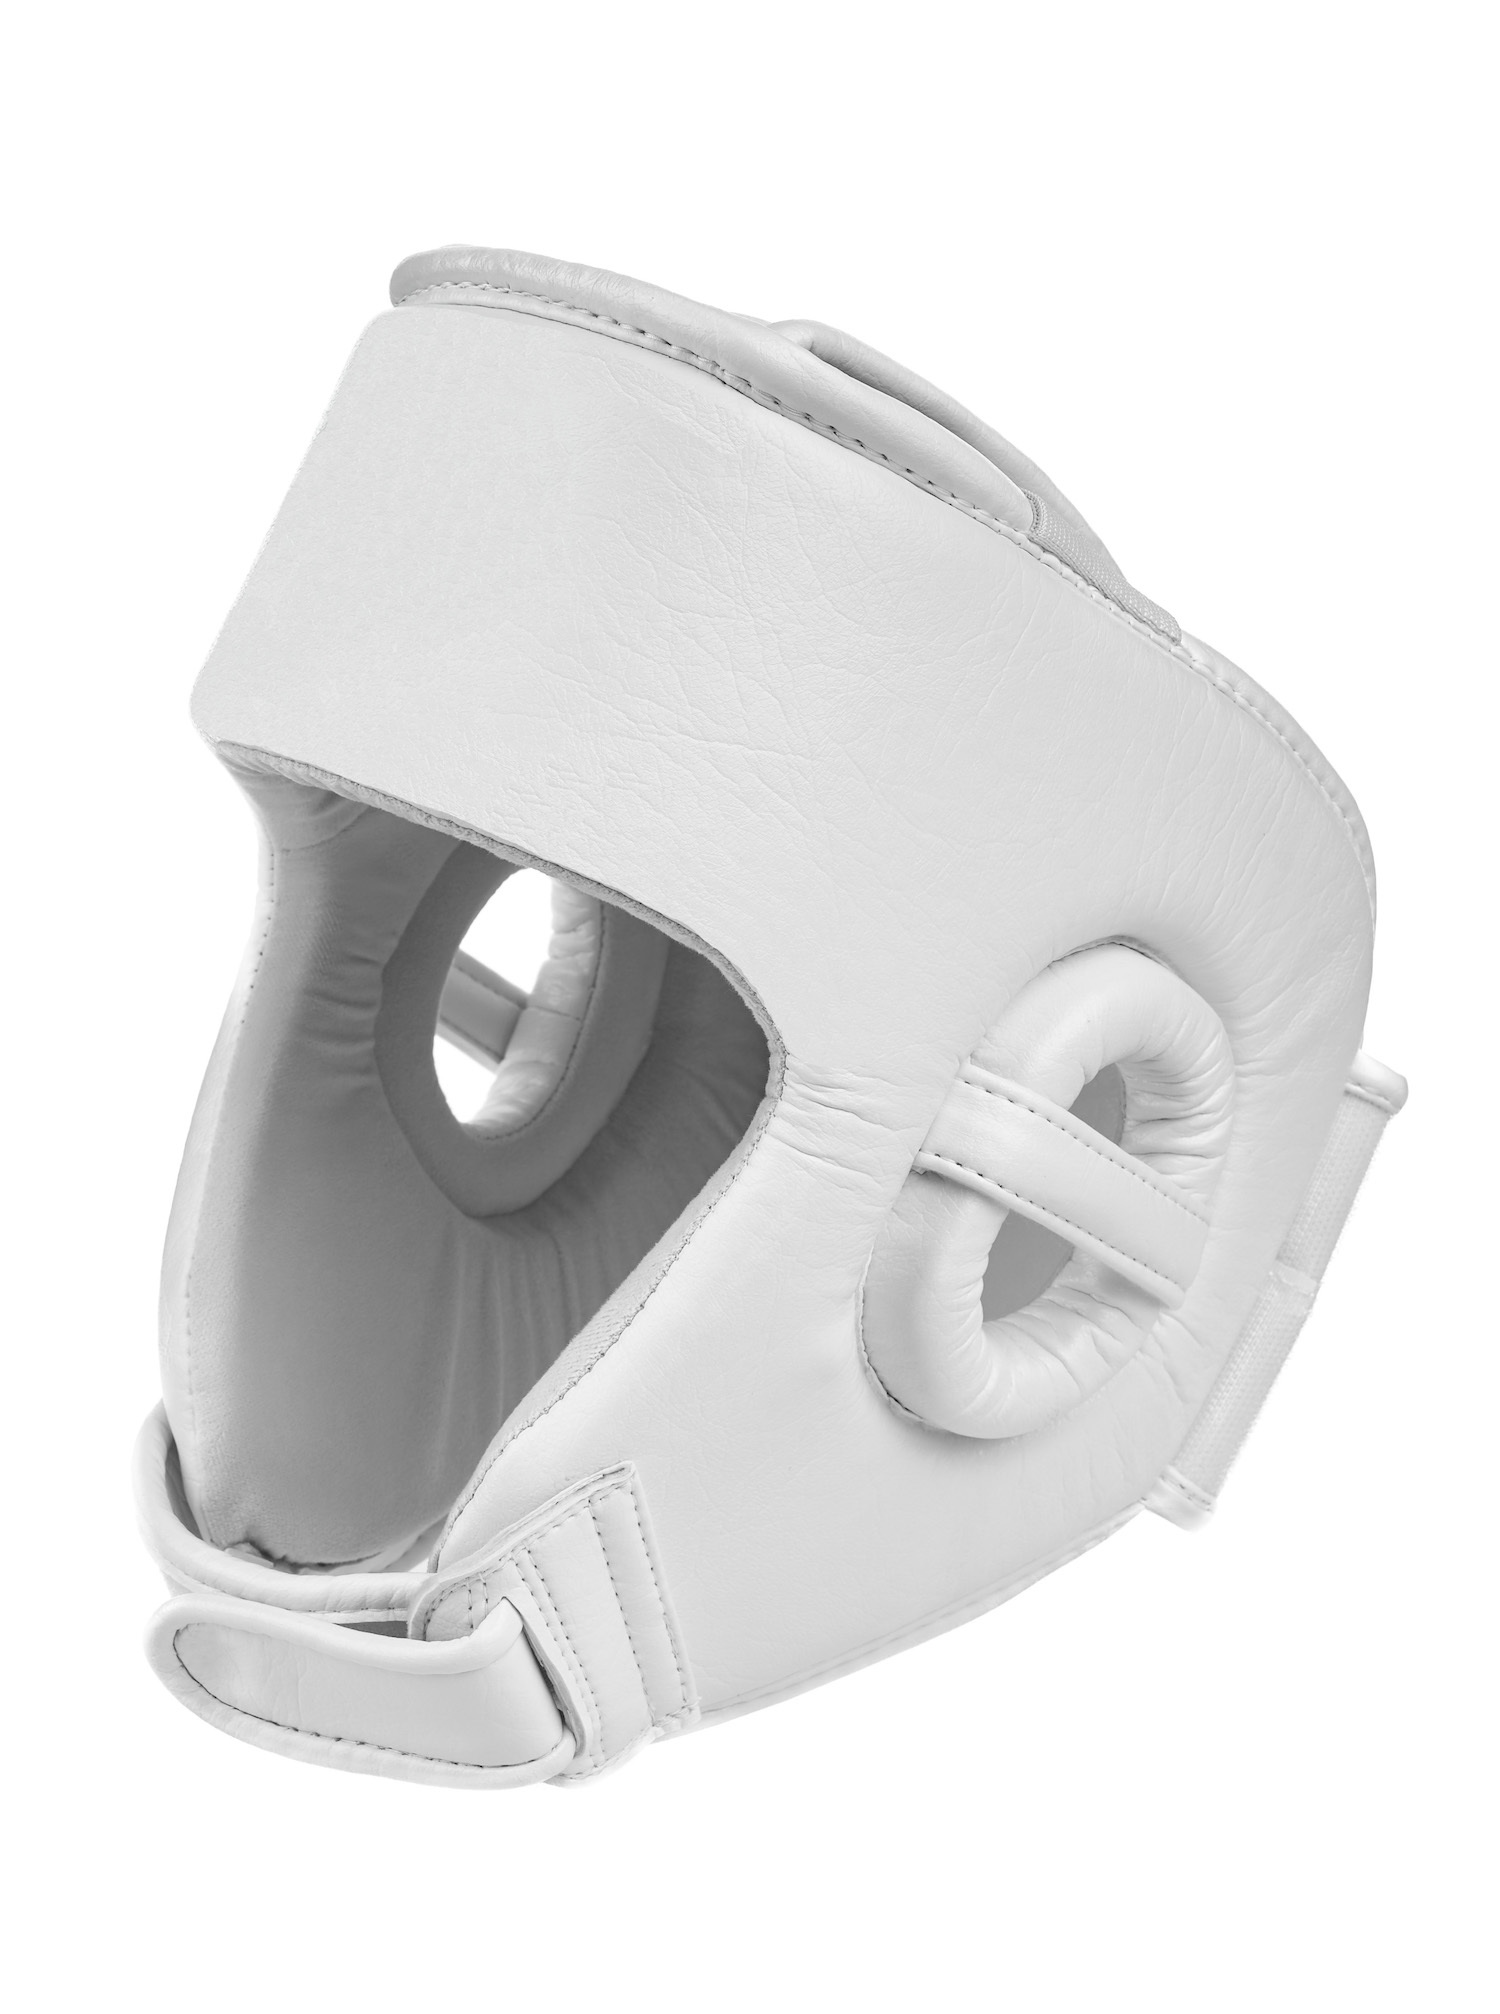 Шлемы Шлем BFS - Открытый / Pro / Кожа IP-17-1.jpg